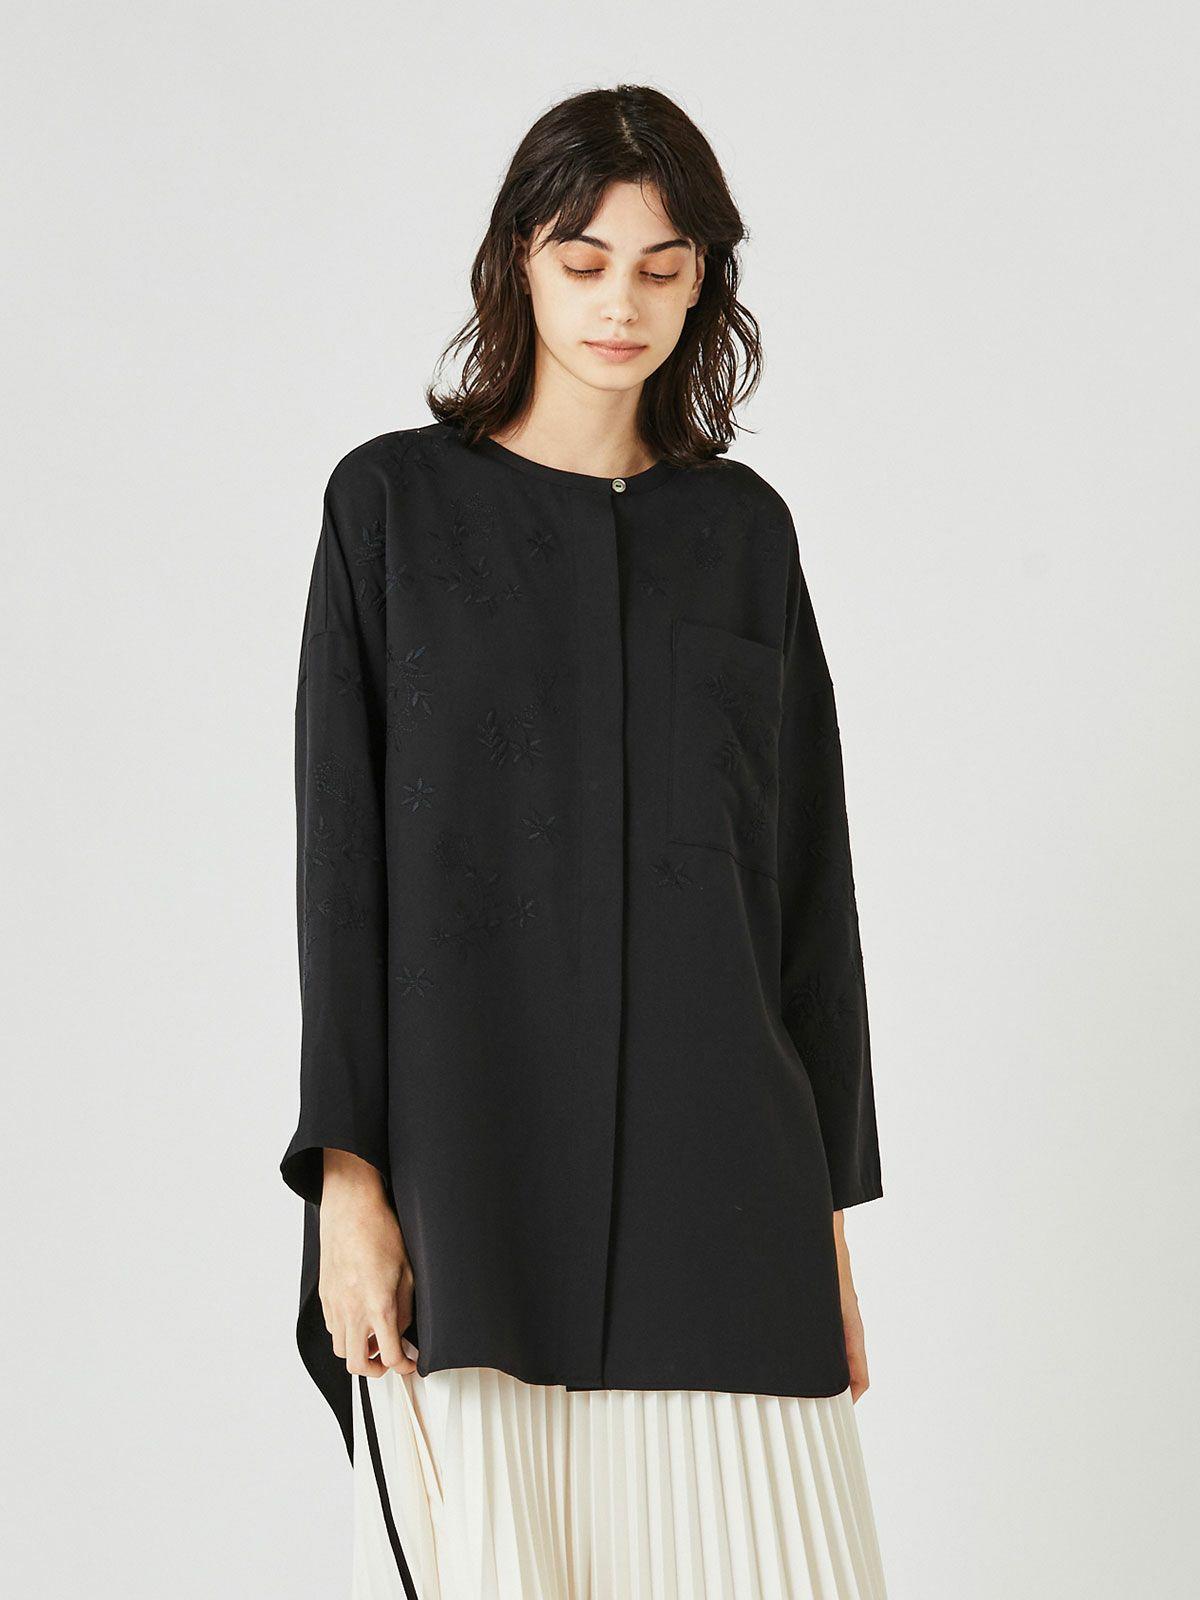 MIDUMISOLID for Ladies ベルト付き刺繍ノーカラーシャツ